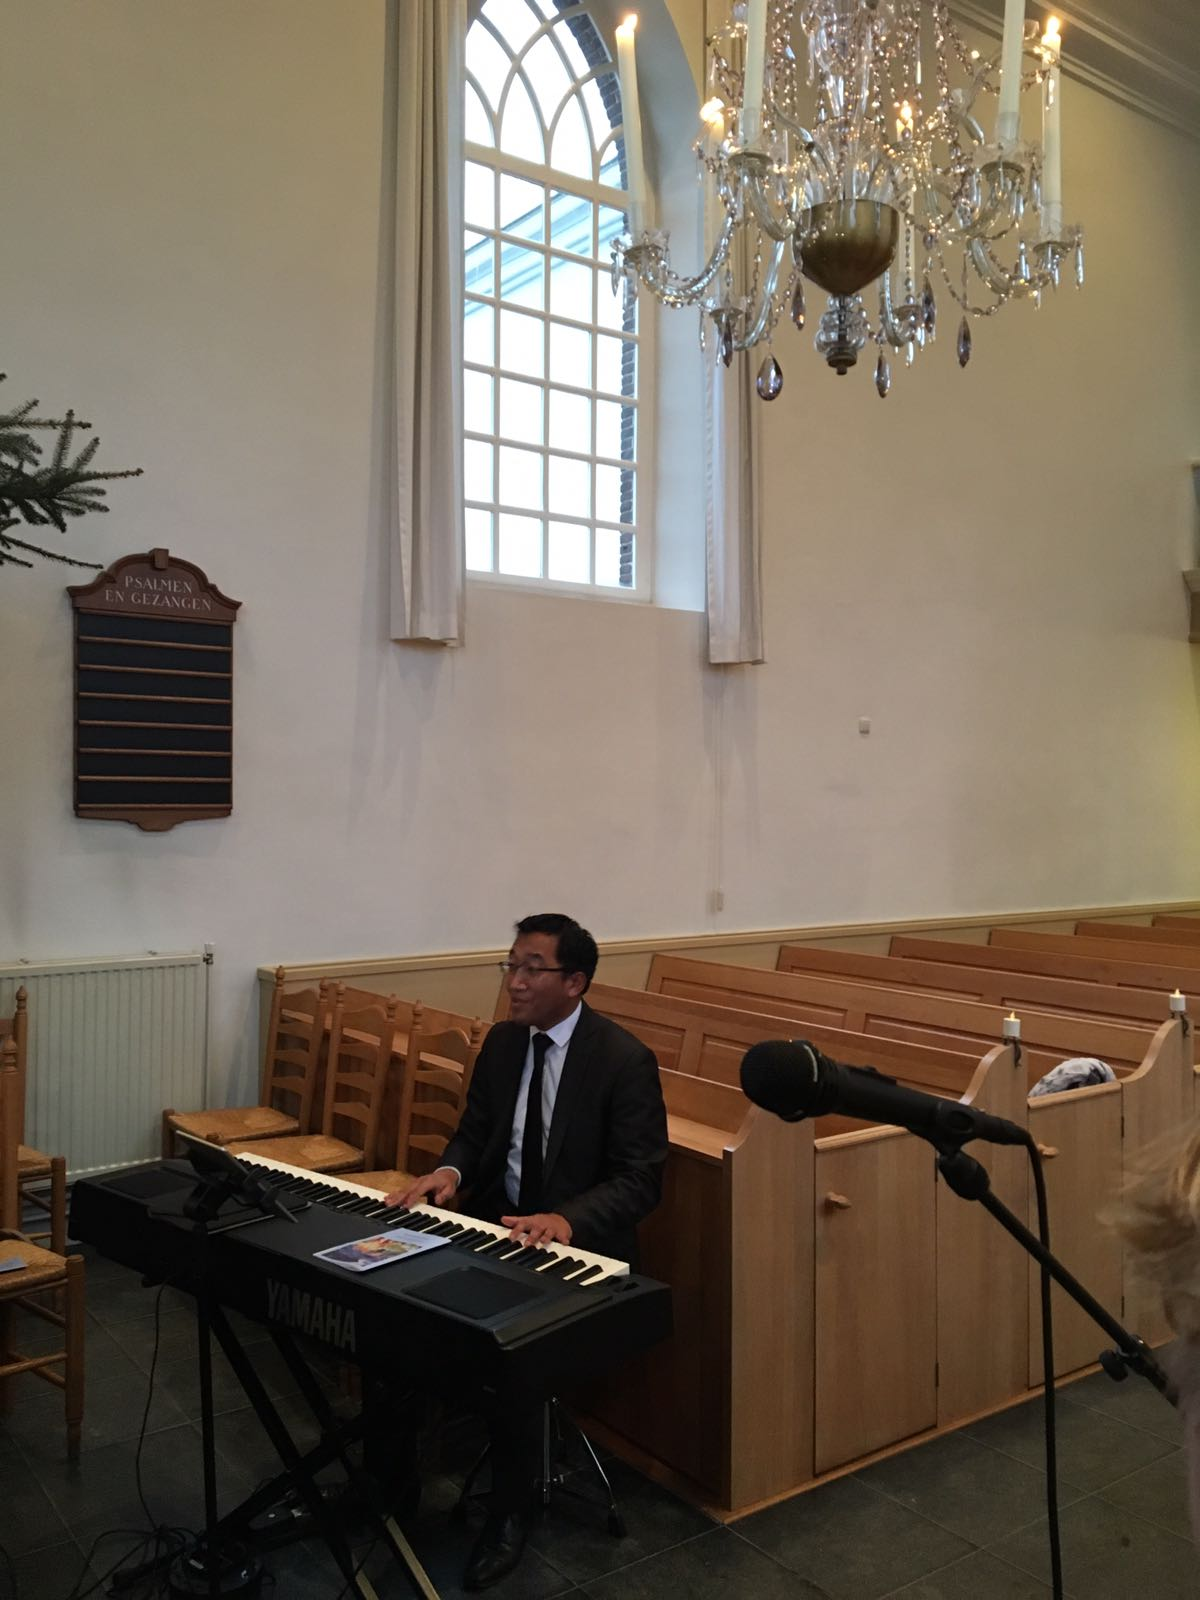 Eerste kerstdag Hervormde kerk te Acquoy